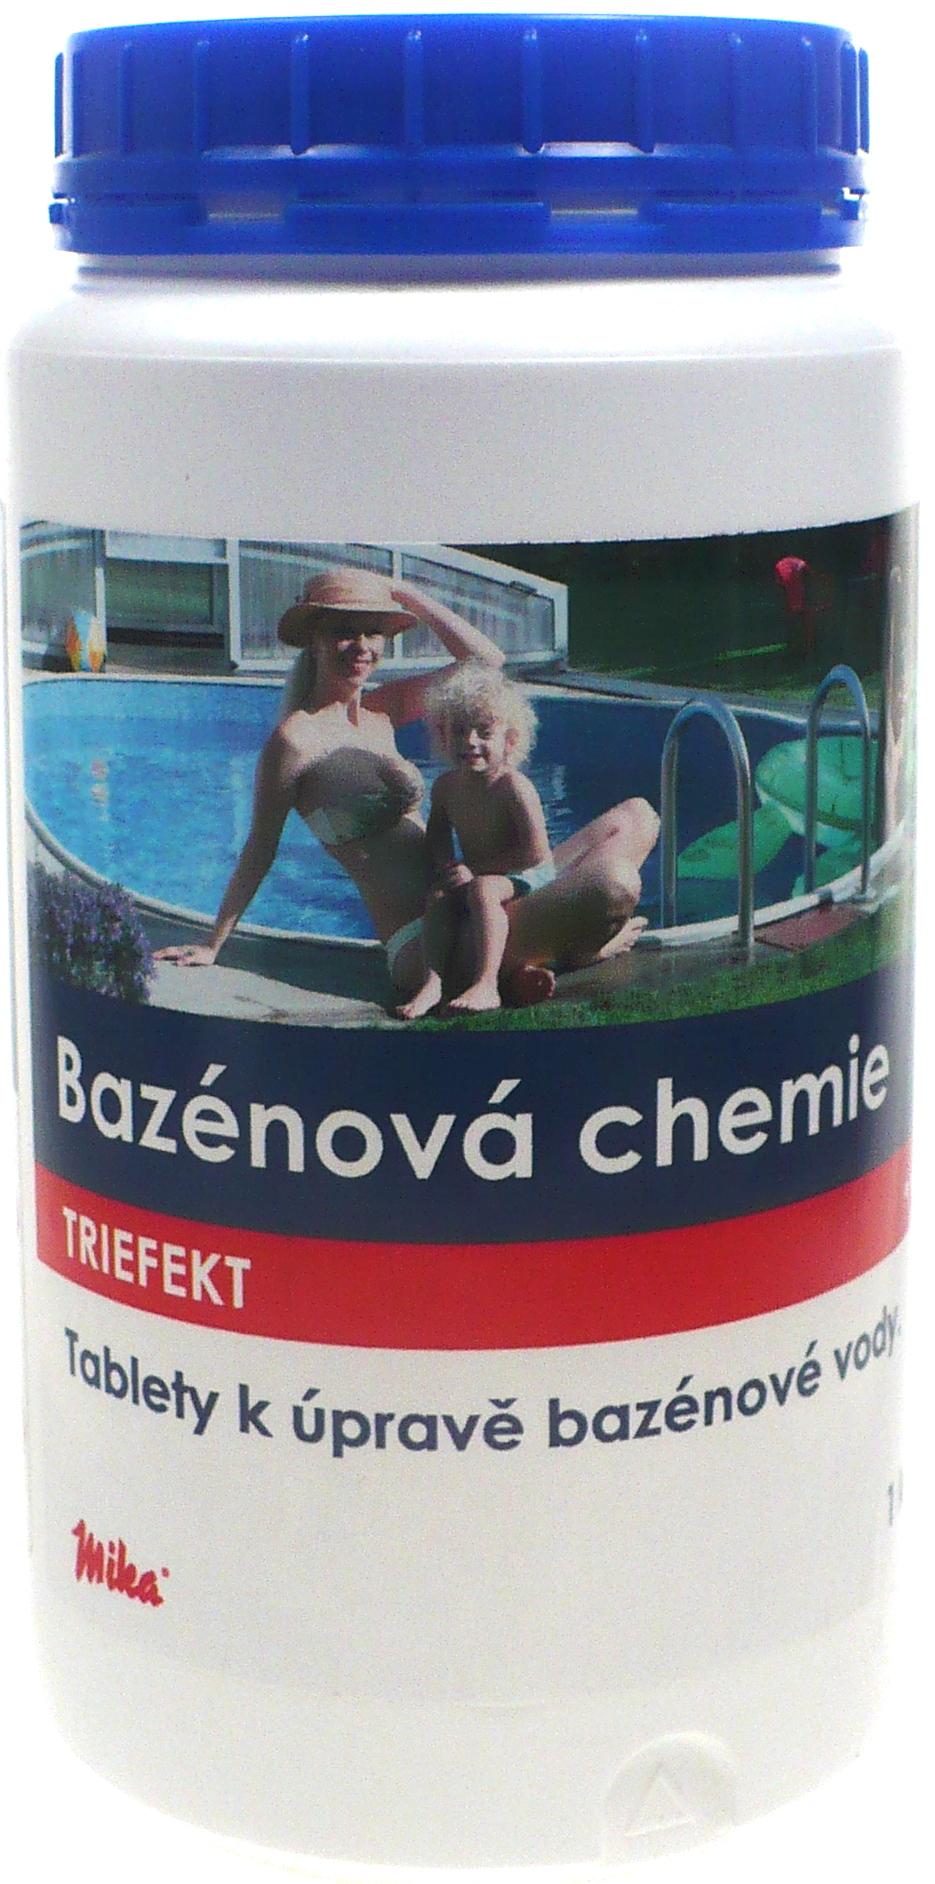 Fotografie Mika Bazénová chemie Triefekt tablety k úpravě bazénové vody 1 kg